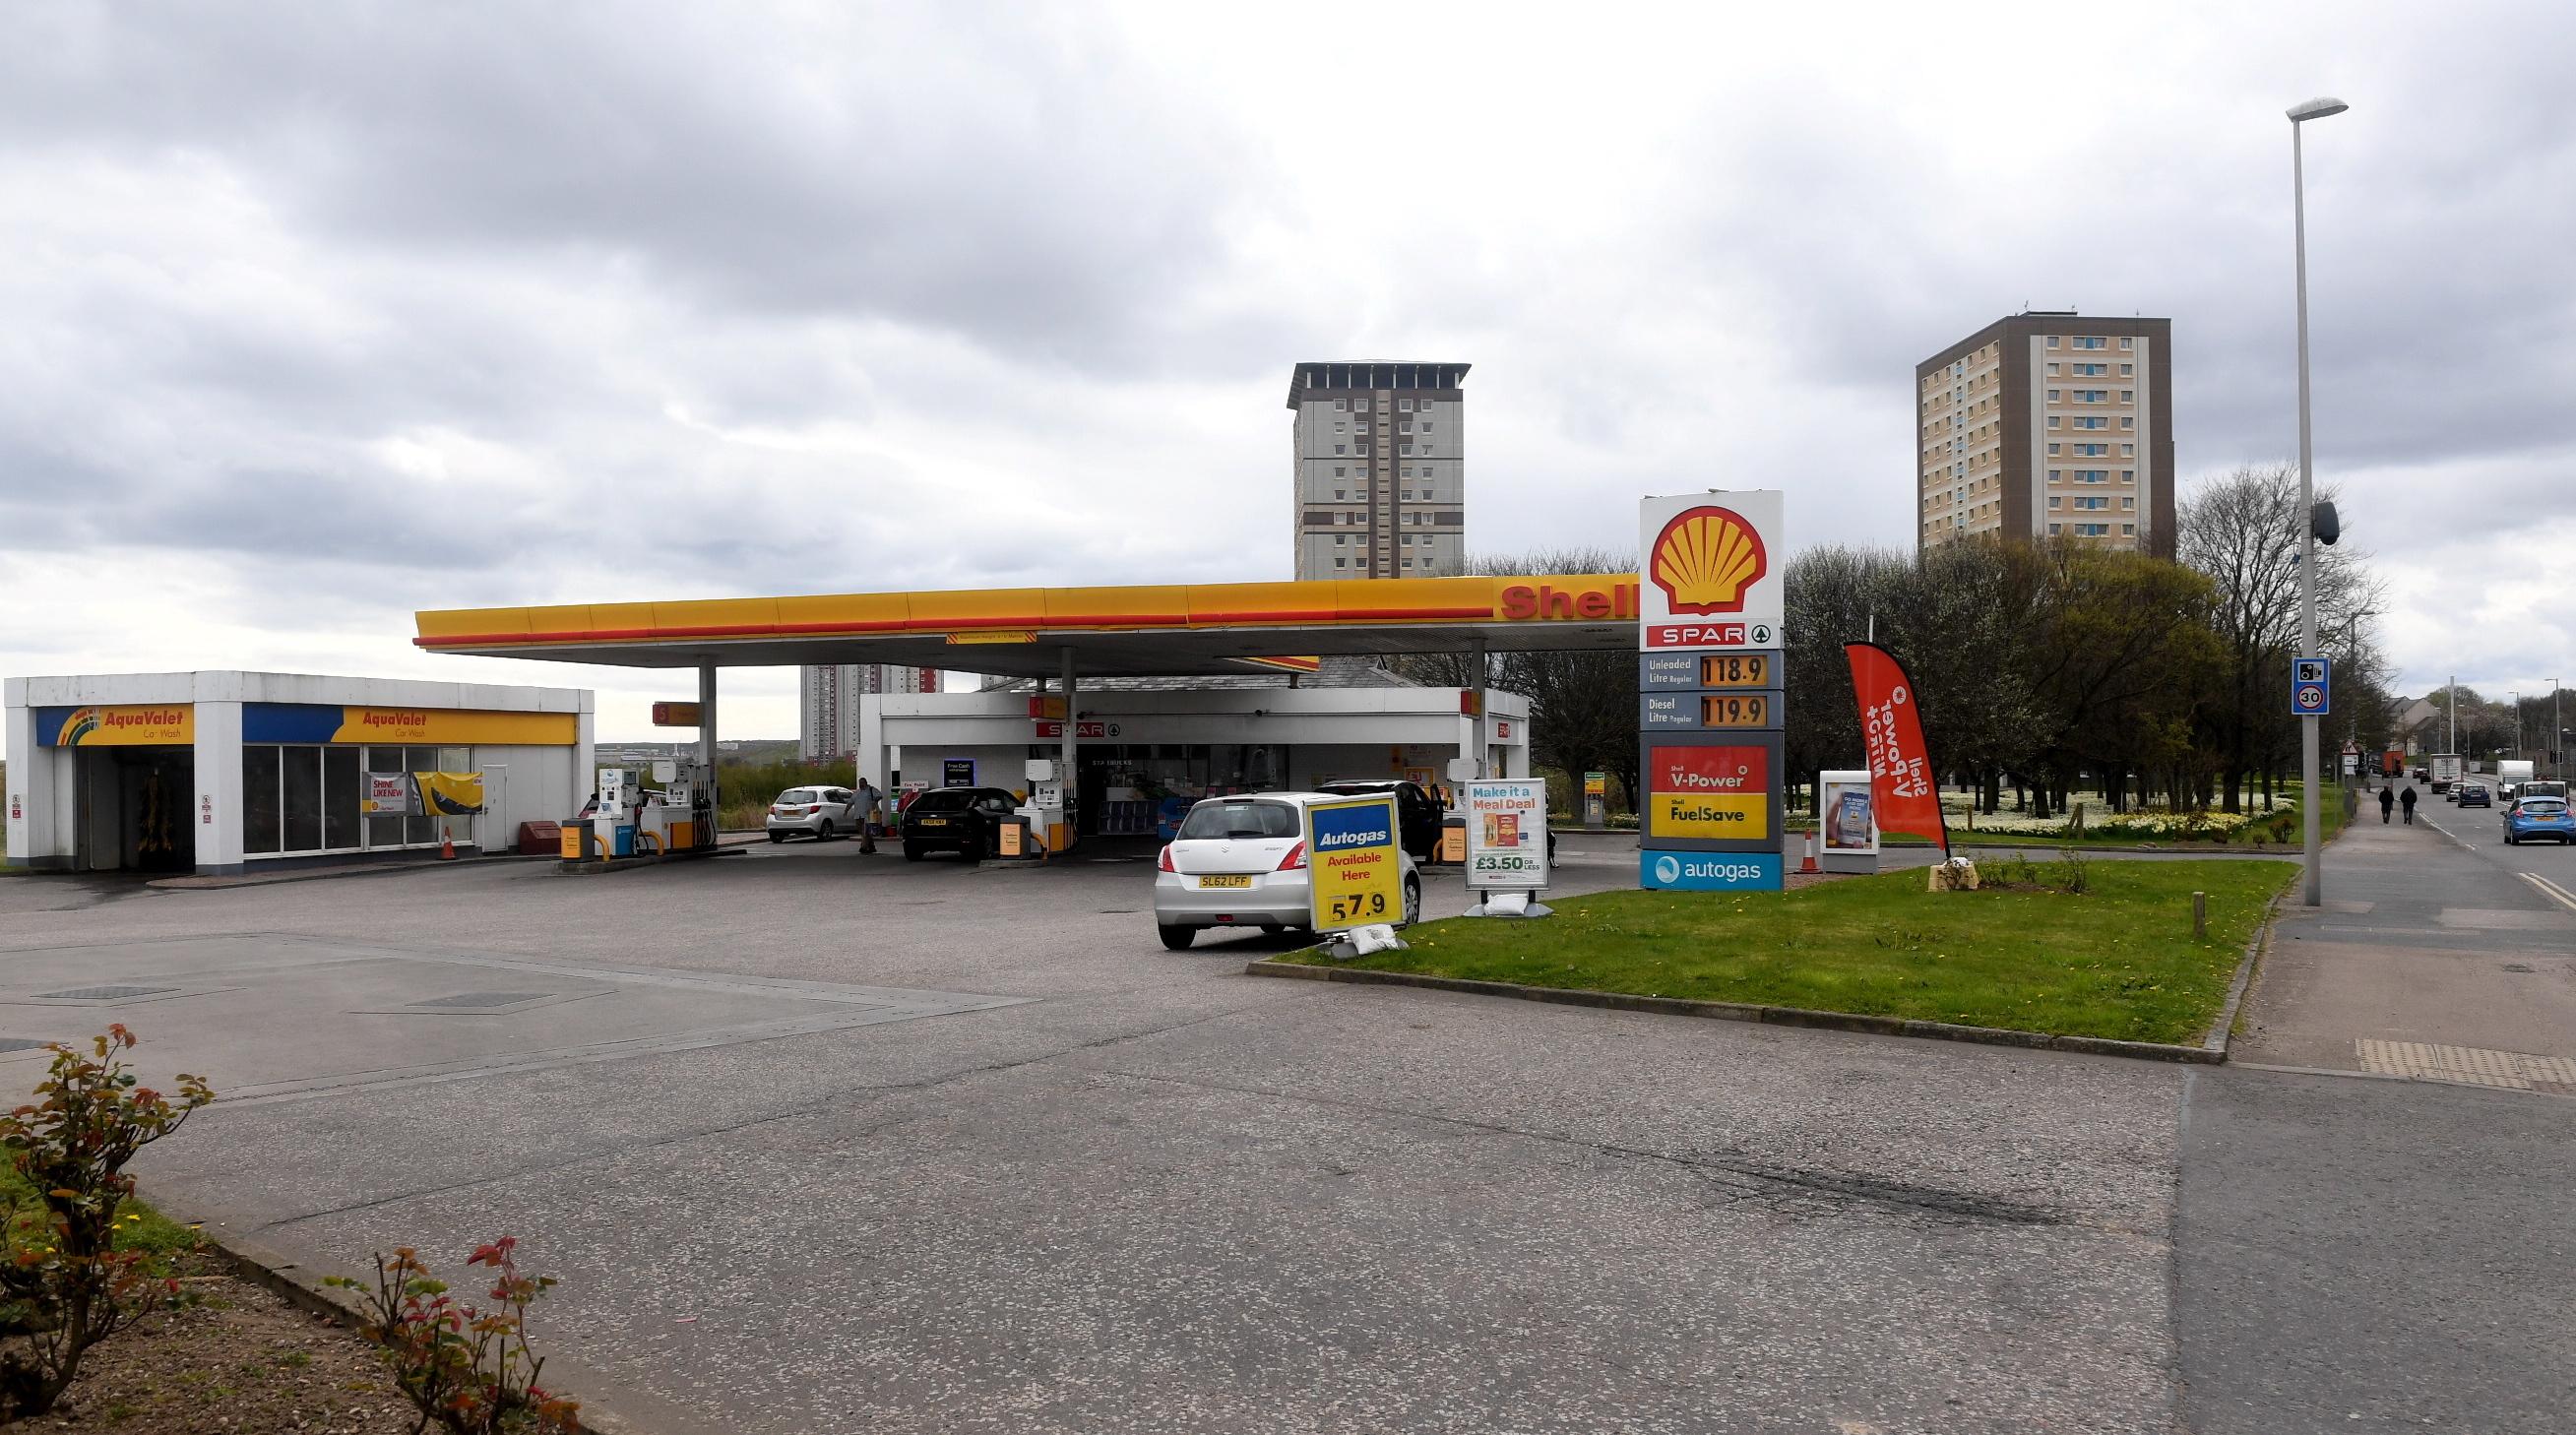 The Shell Garage  on Aberdeen's King Street.